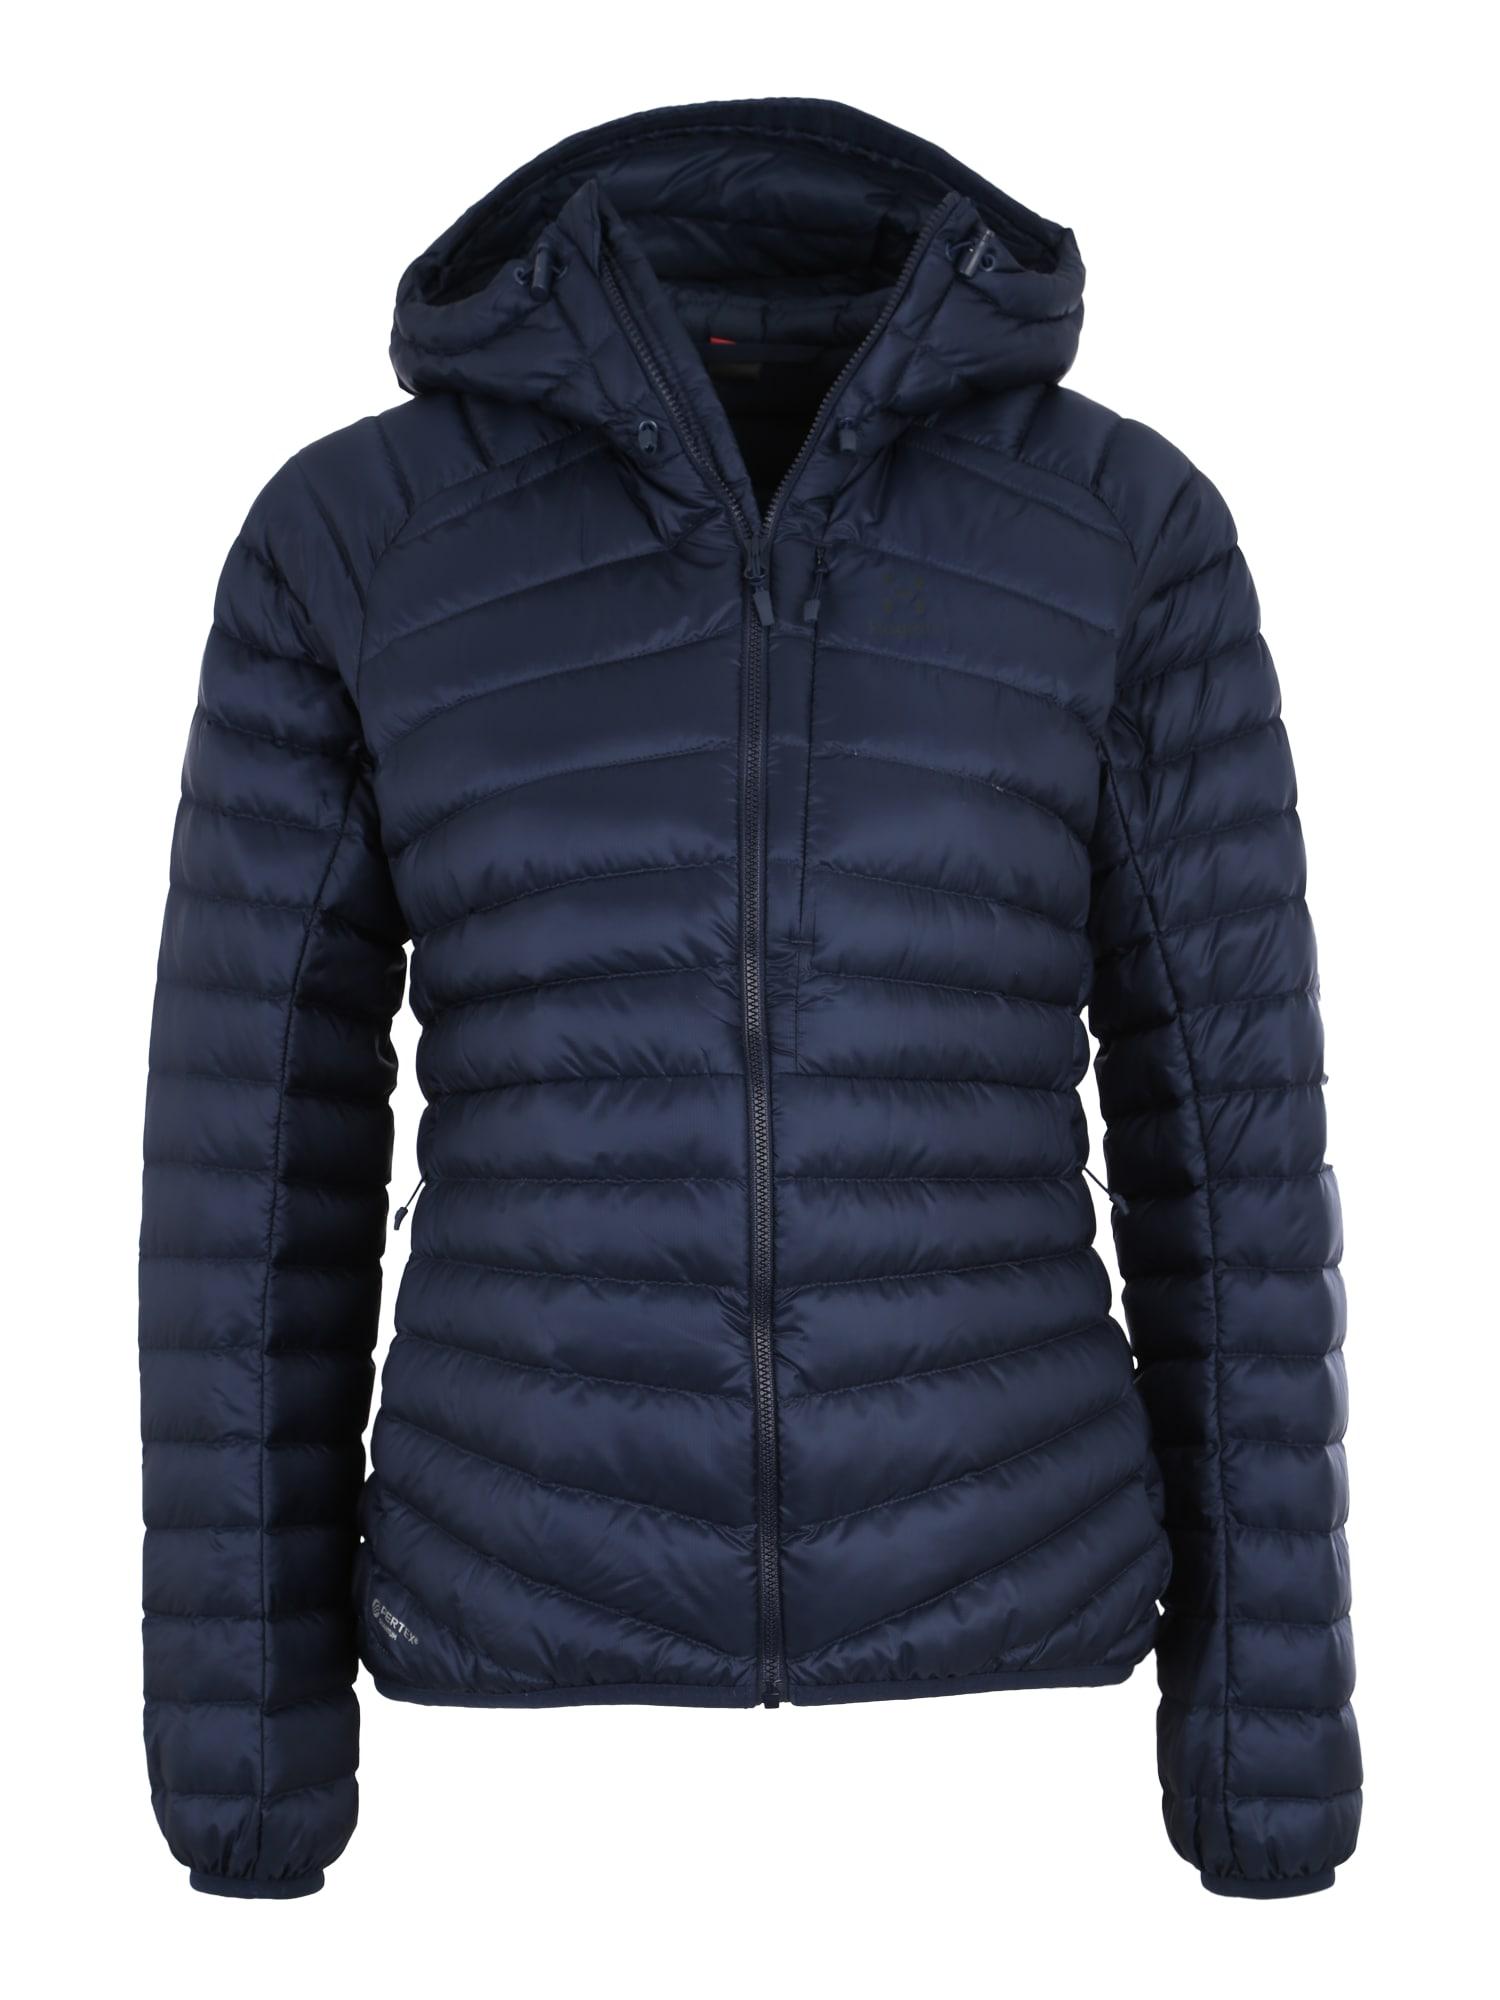 Outdoorová bunda modrá Haglöfs